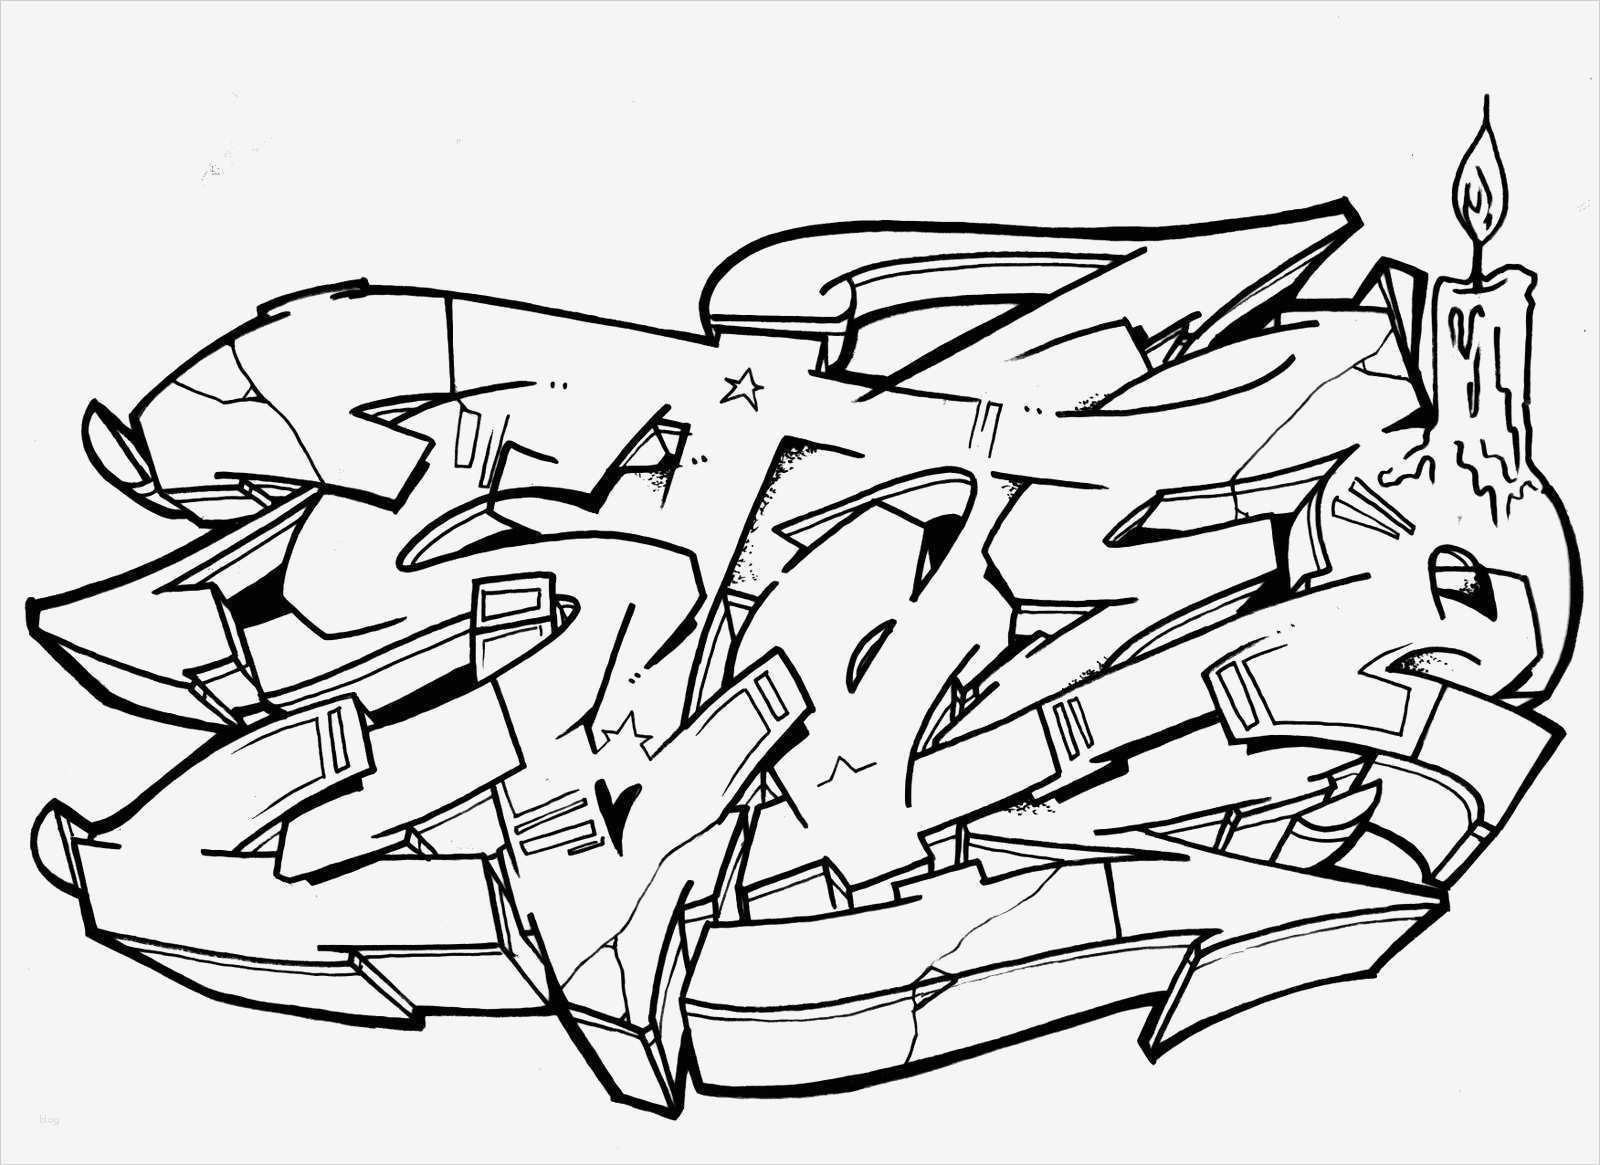 graffiti vorlagen angenehm graffiti bilder zum ausmalen